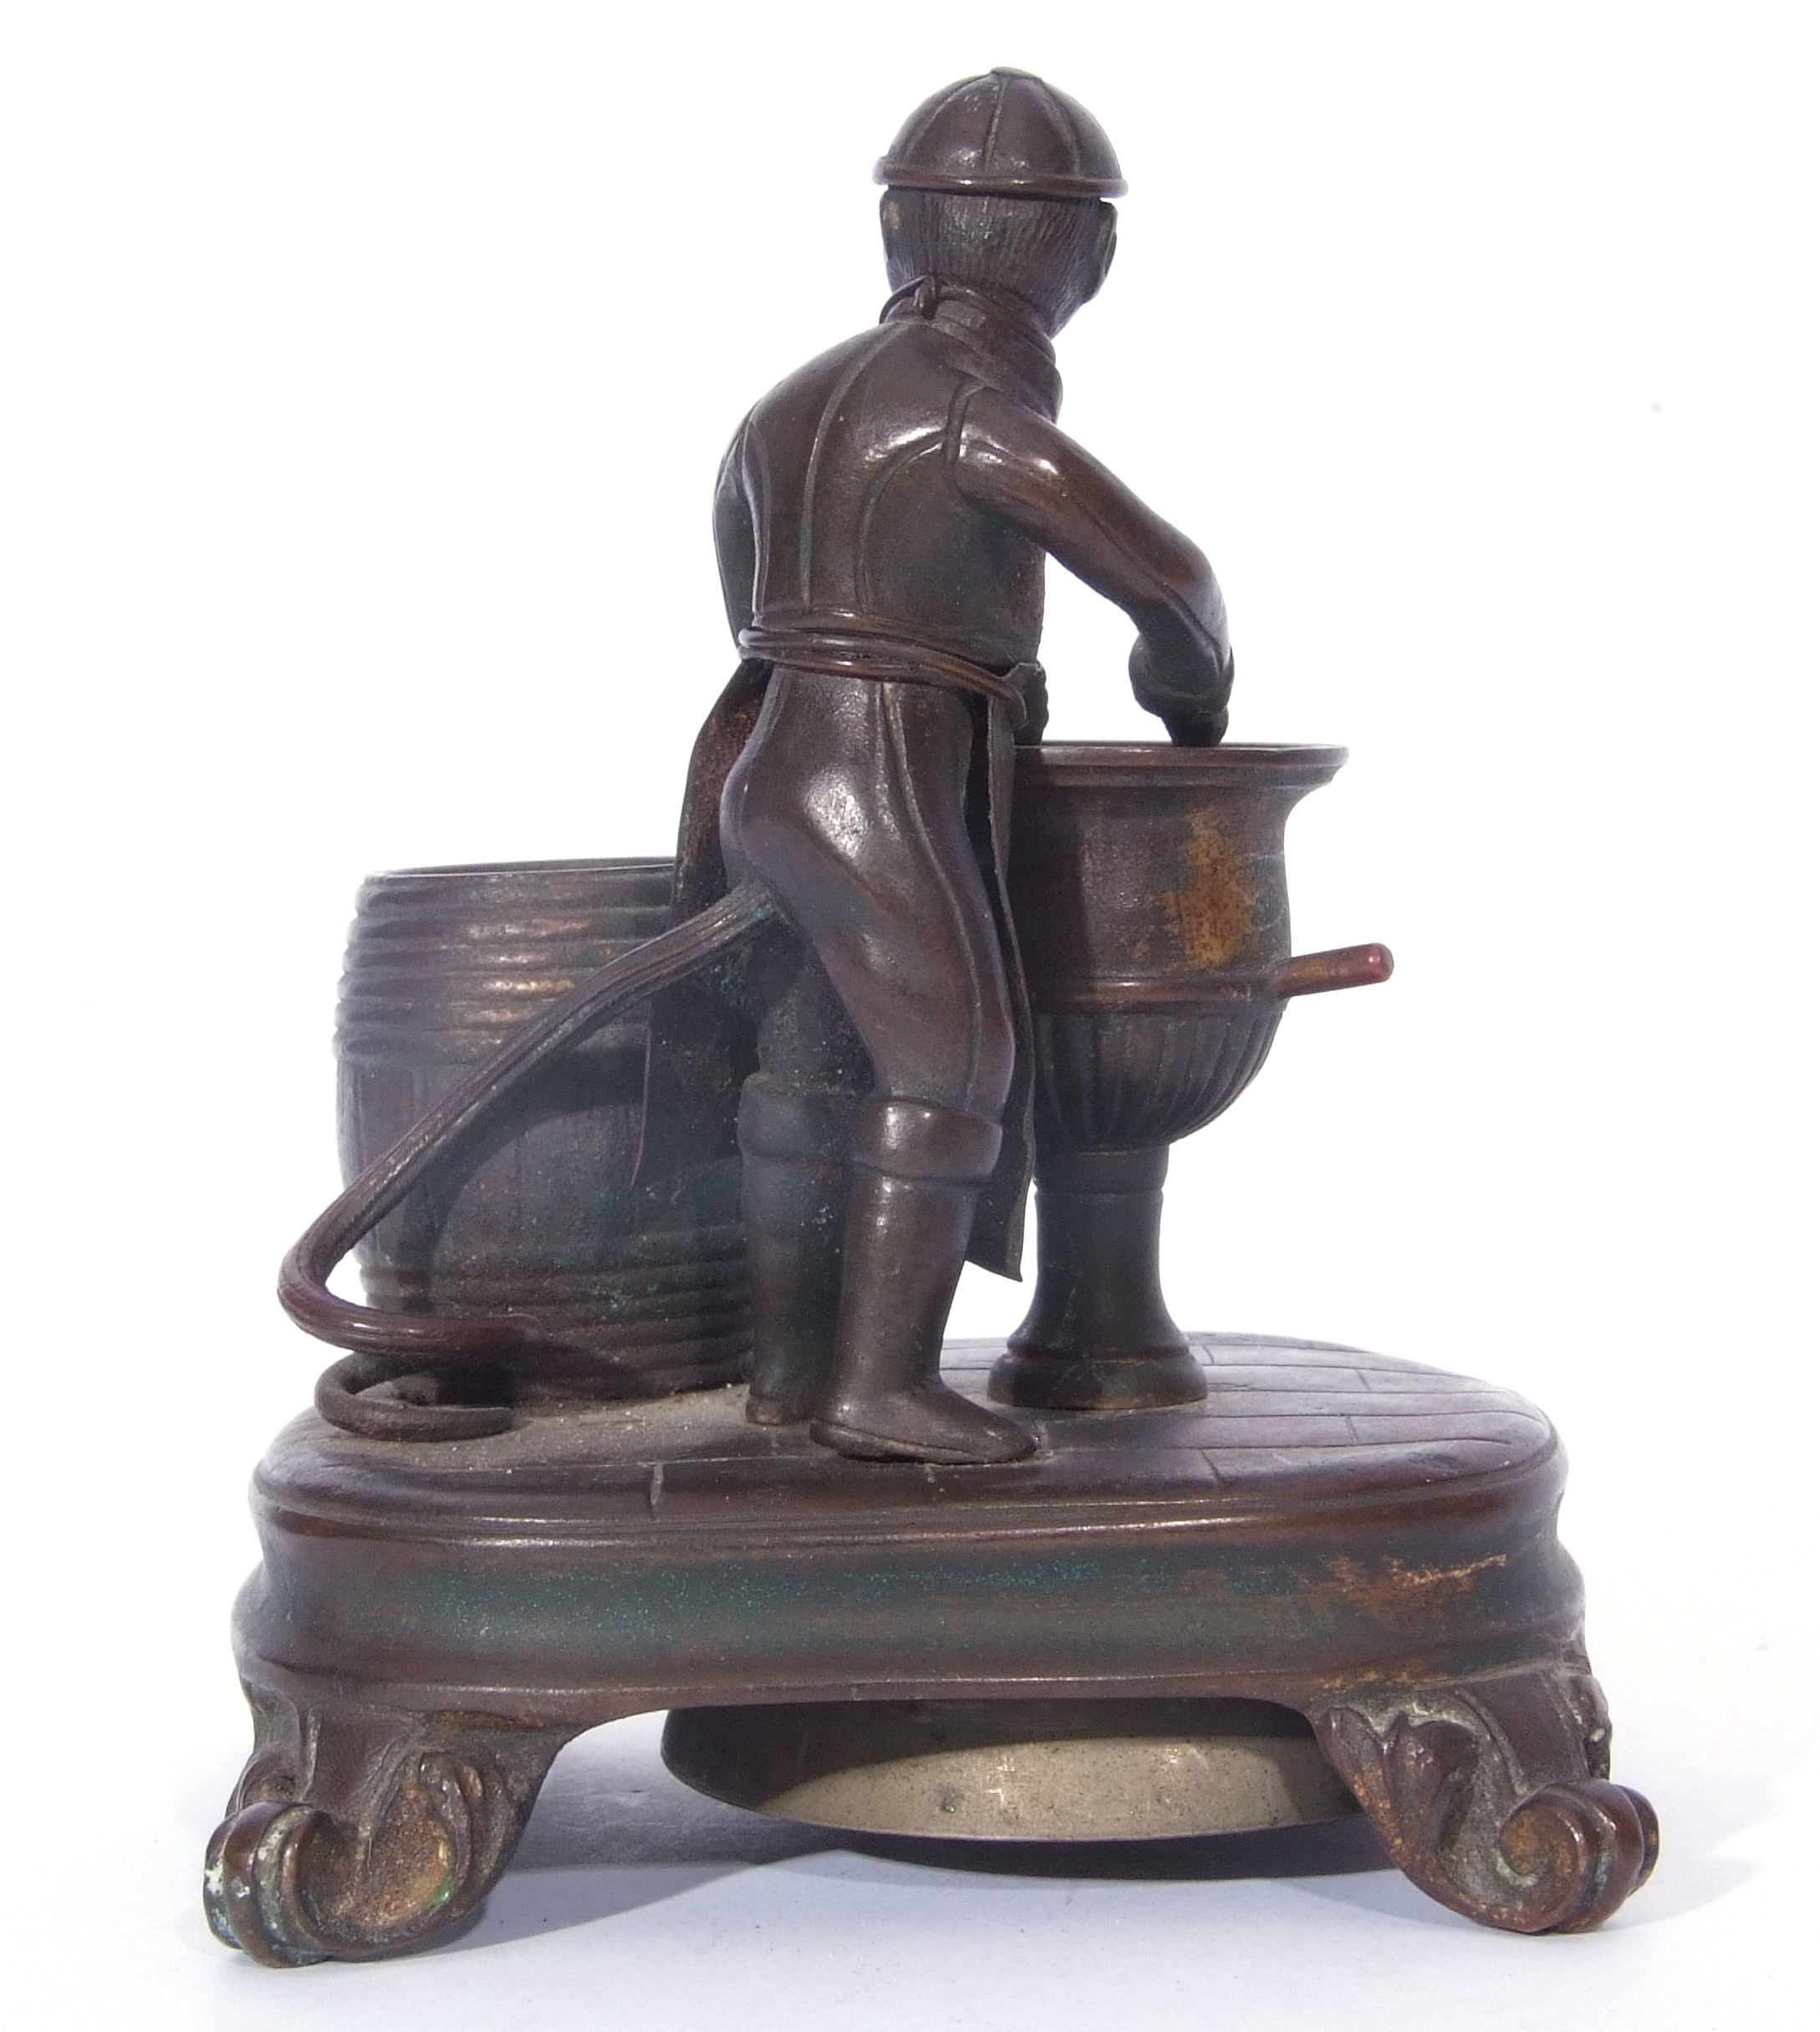 Antique bronze desk bell, a model of a monkey - Image 5 of 11